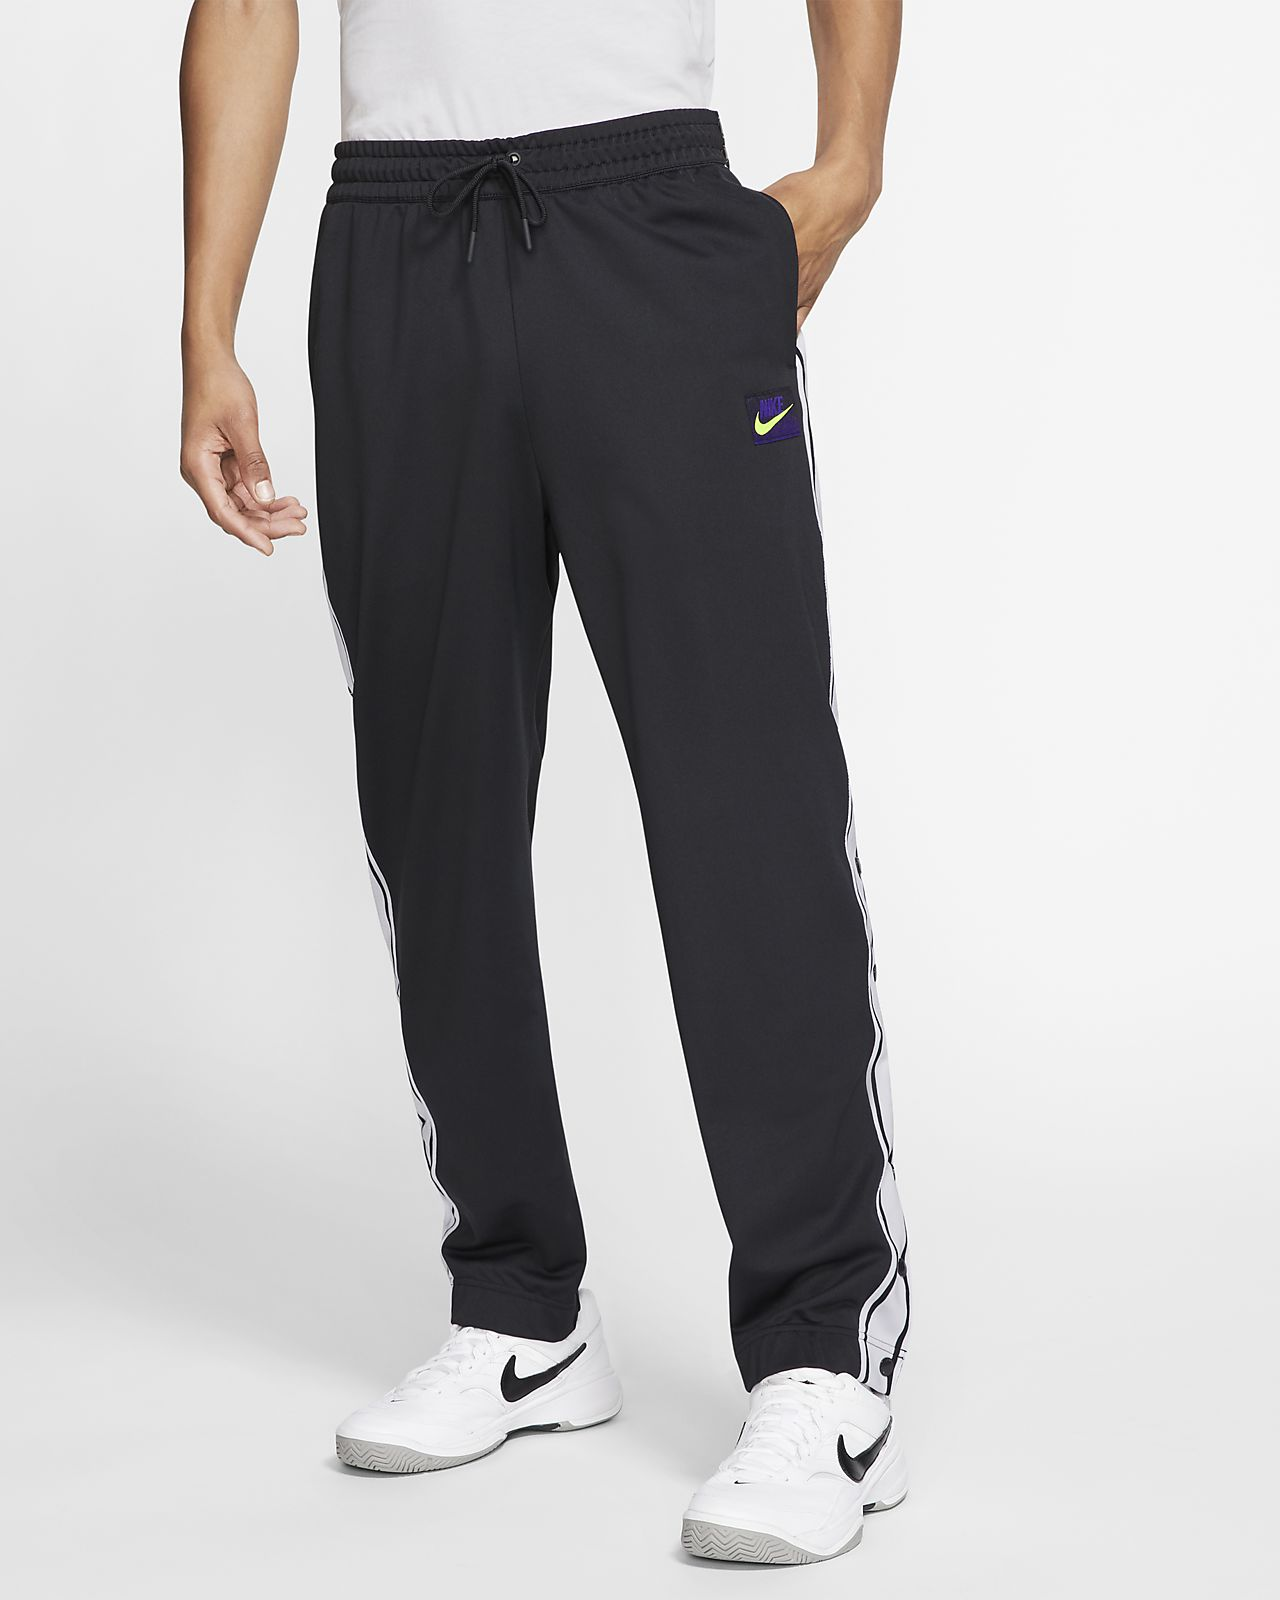 Pantalon Homme Tennis Slam Pour De Nikecourt n0O8wkXP